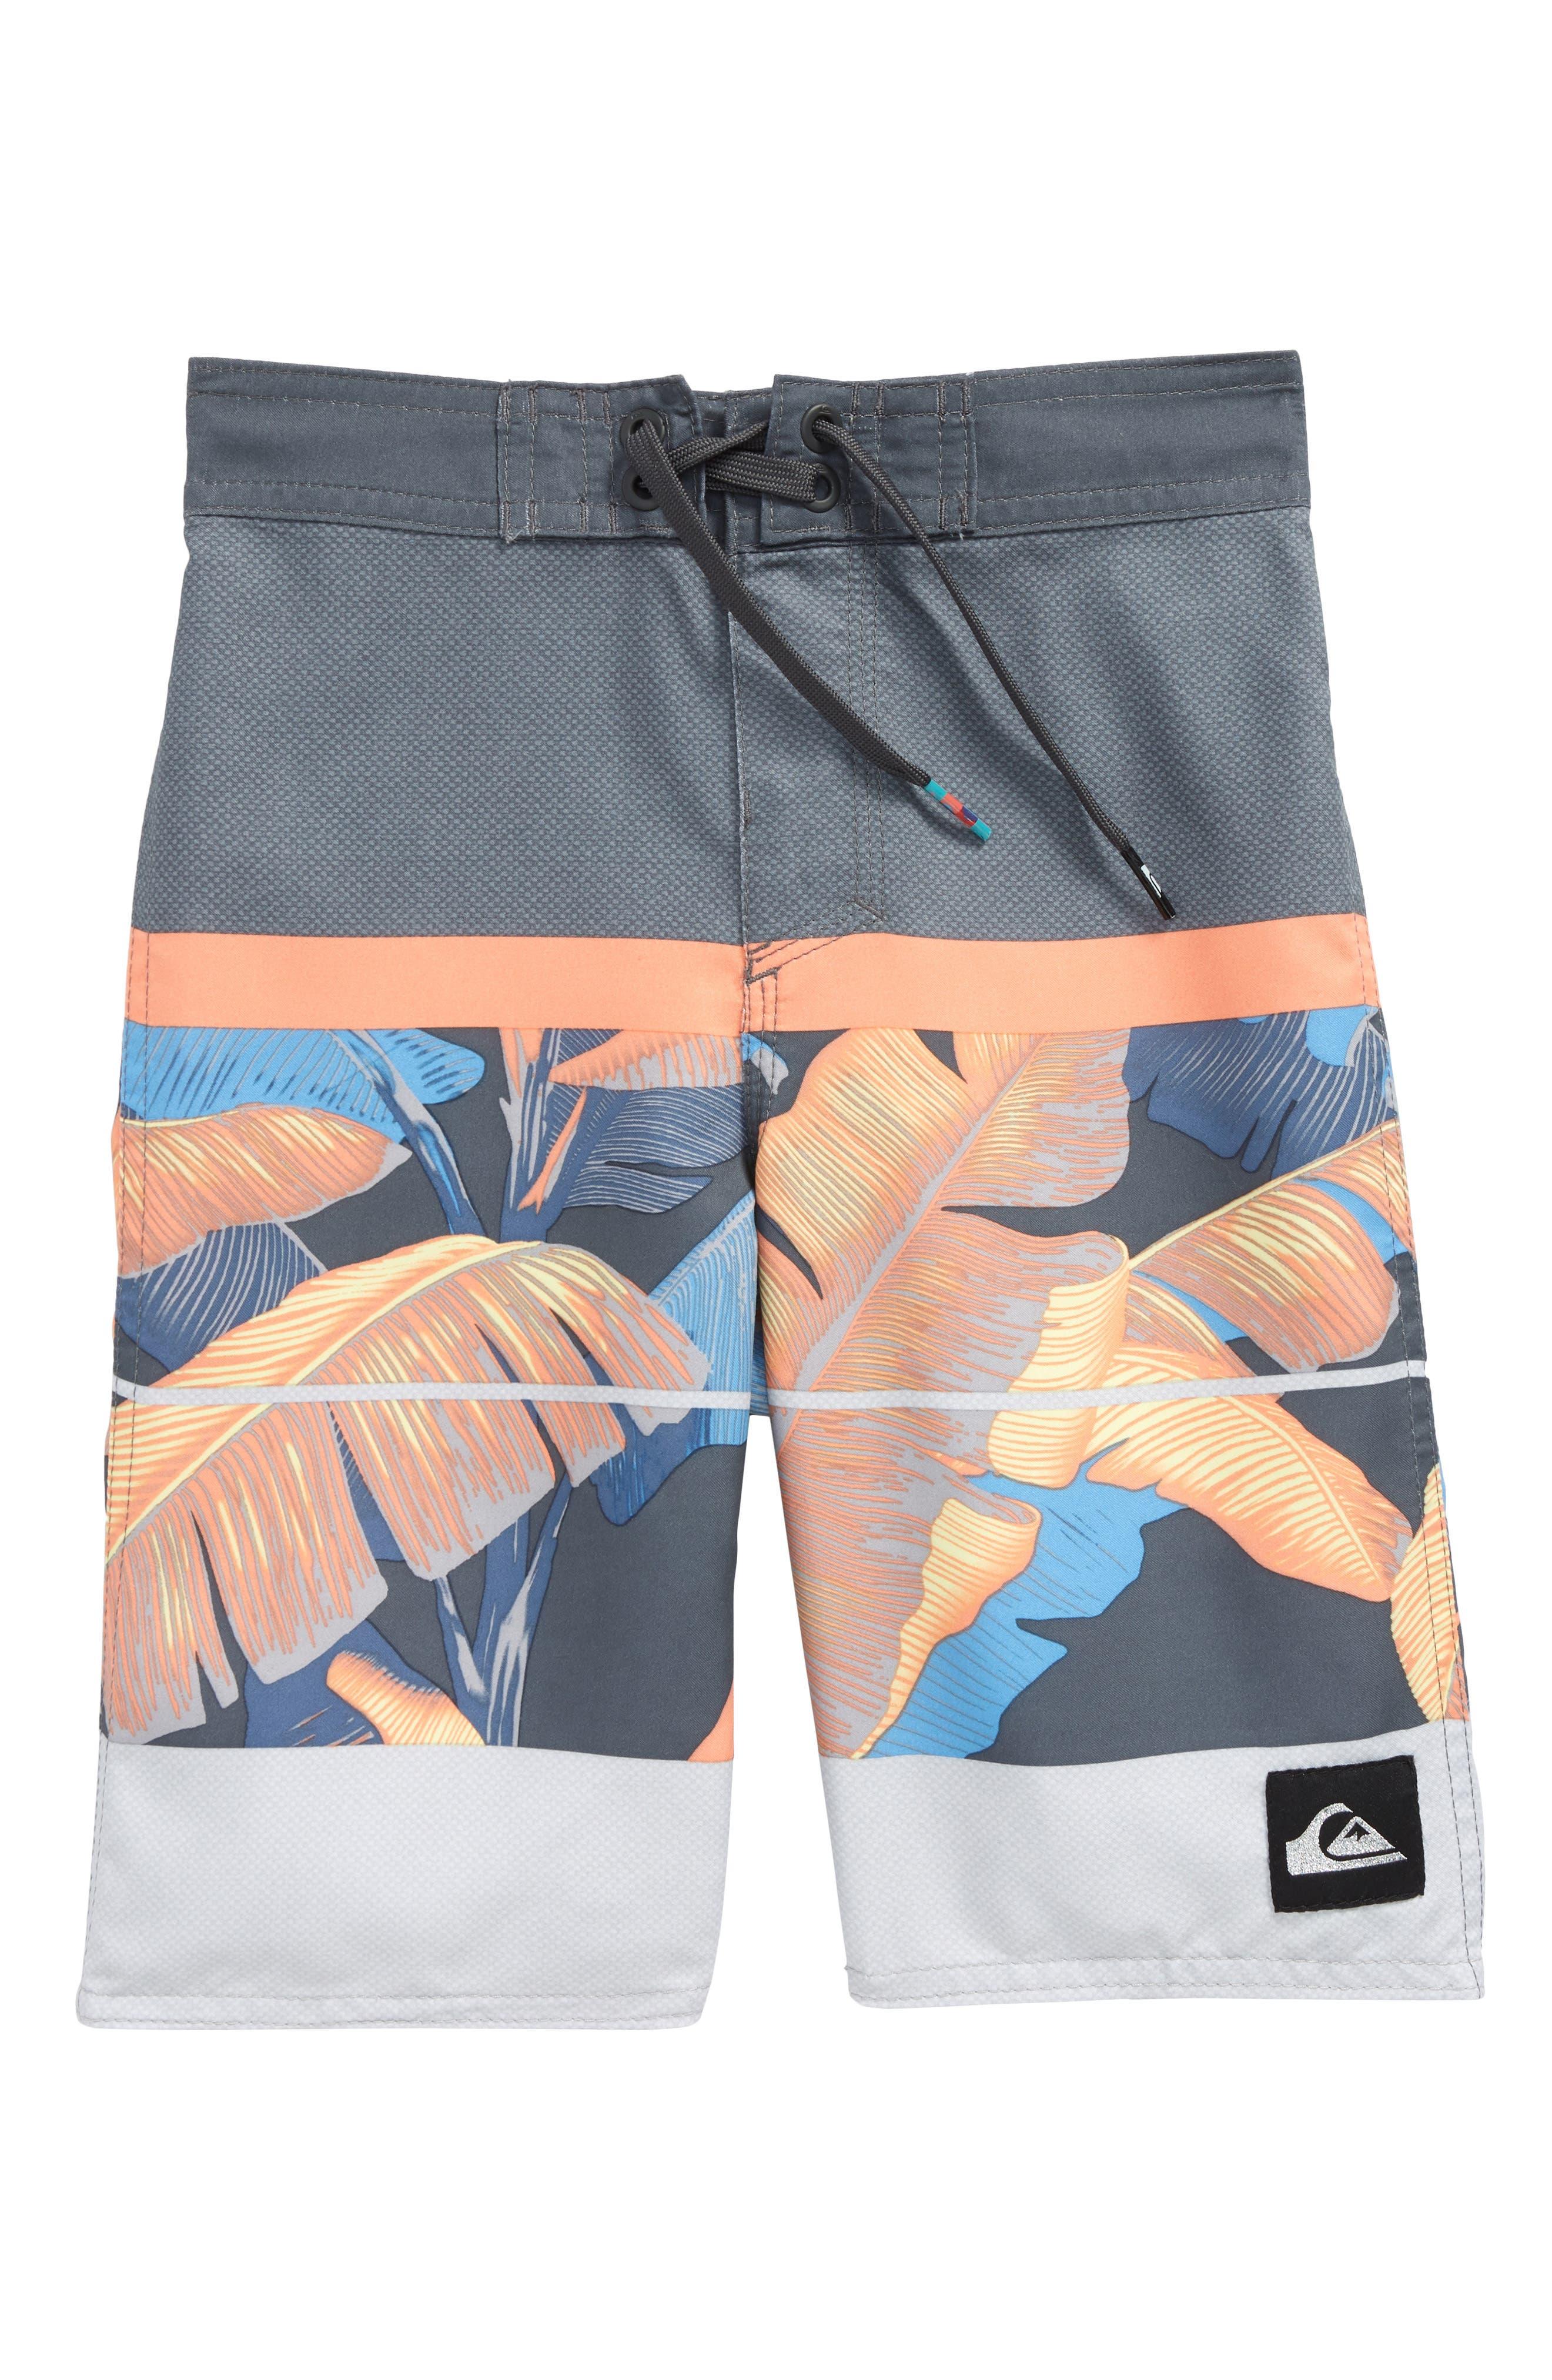 Slab Island Board Shorts,                         Main,                         color, Tarmac